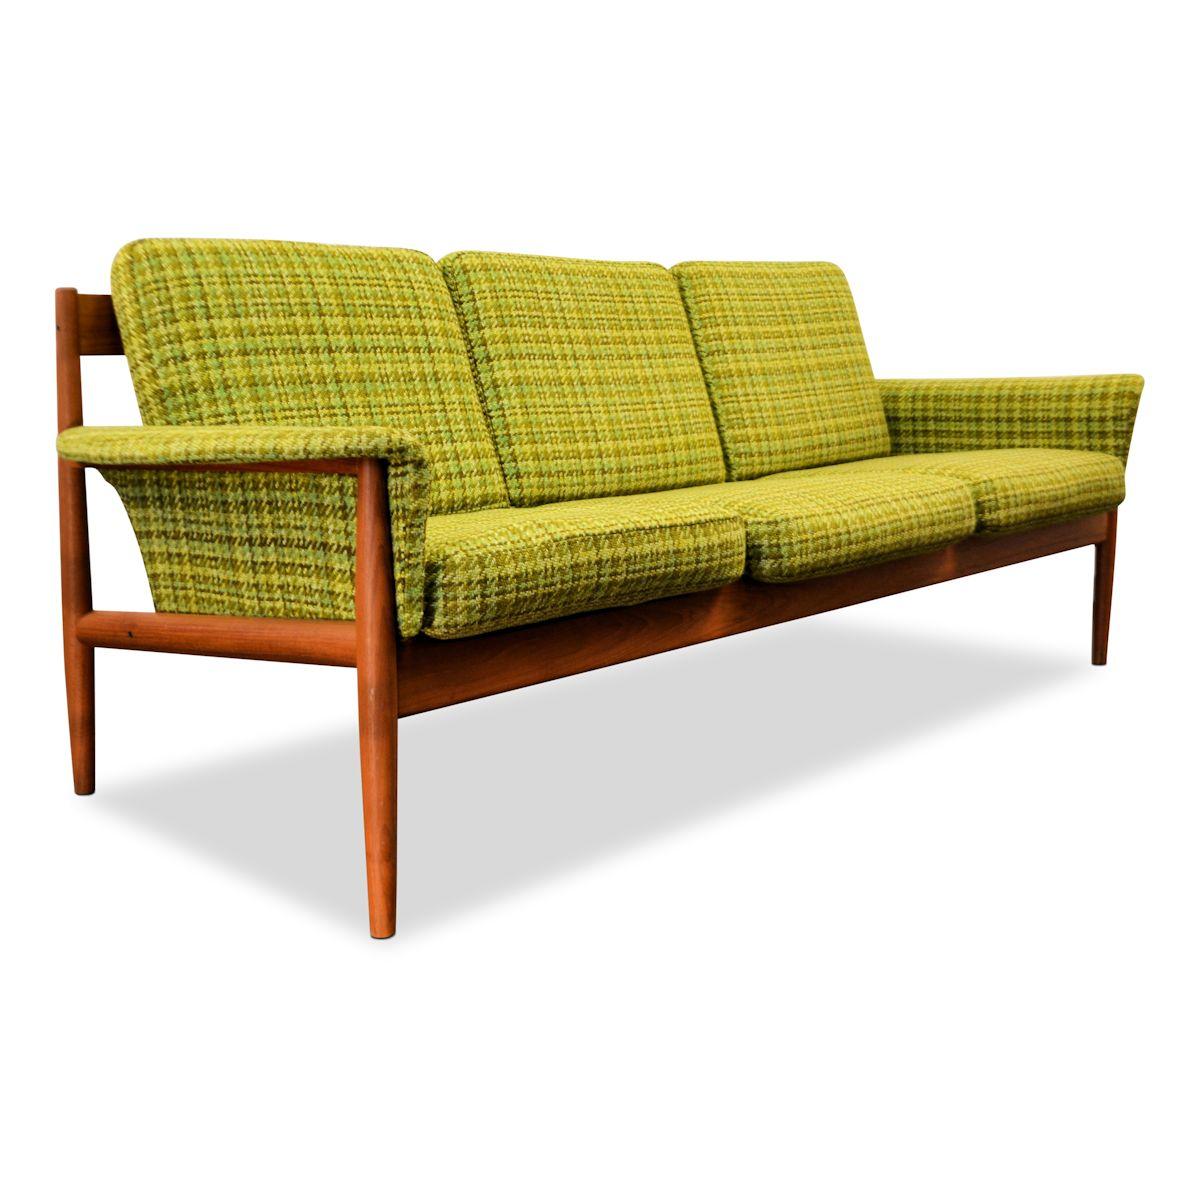 Deens Design Vintage Bank.Vintage Three Seater Sofa By Grete Jalk Vintage Vibes